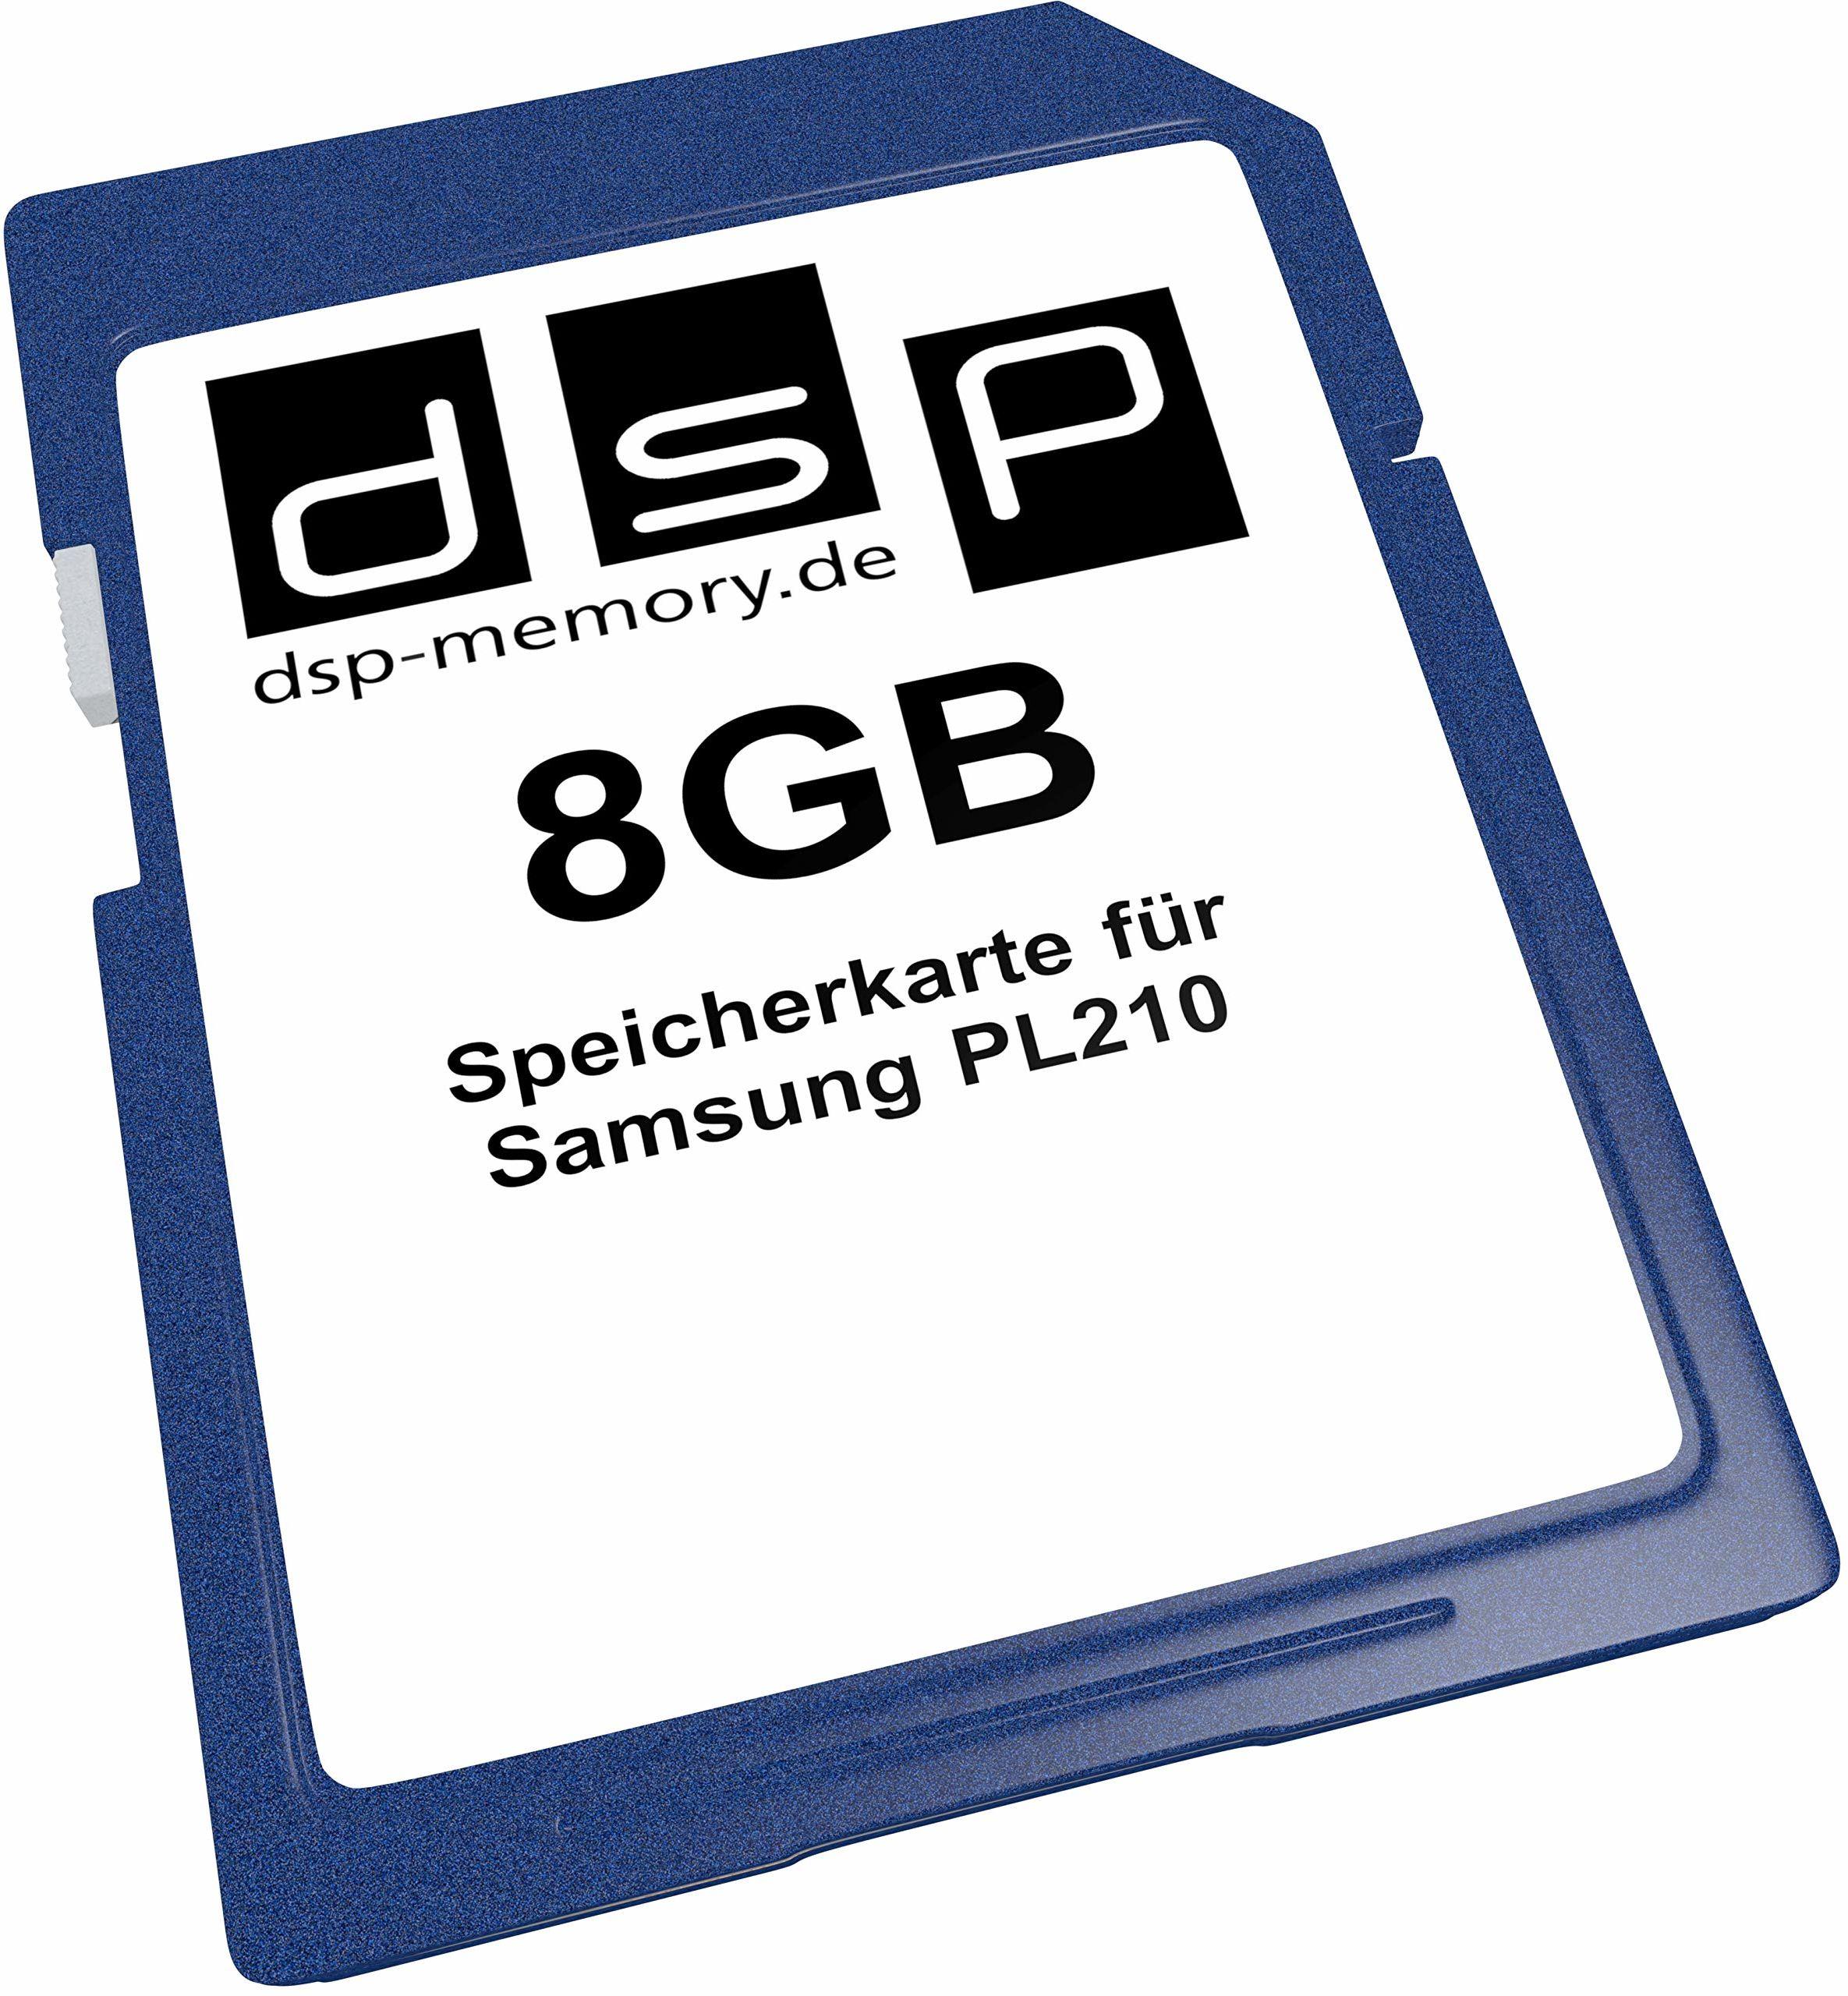 Karta pamięci 8 GB do Samsung PL210